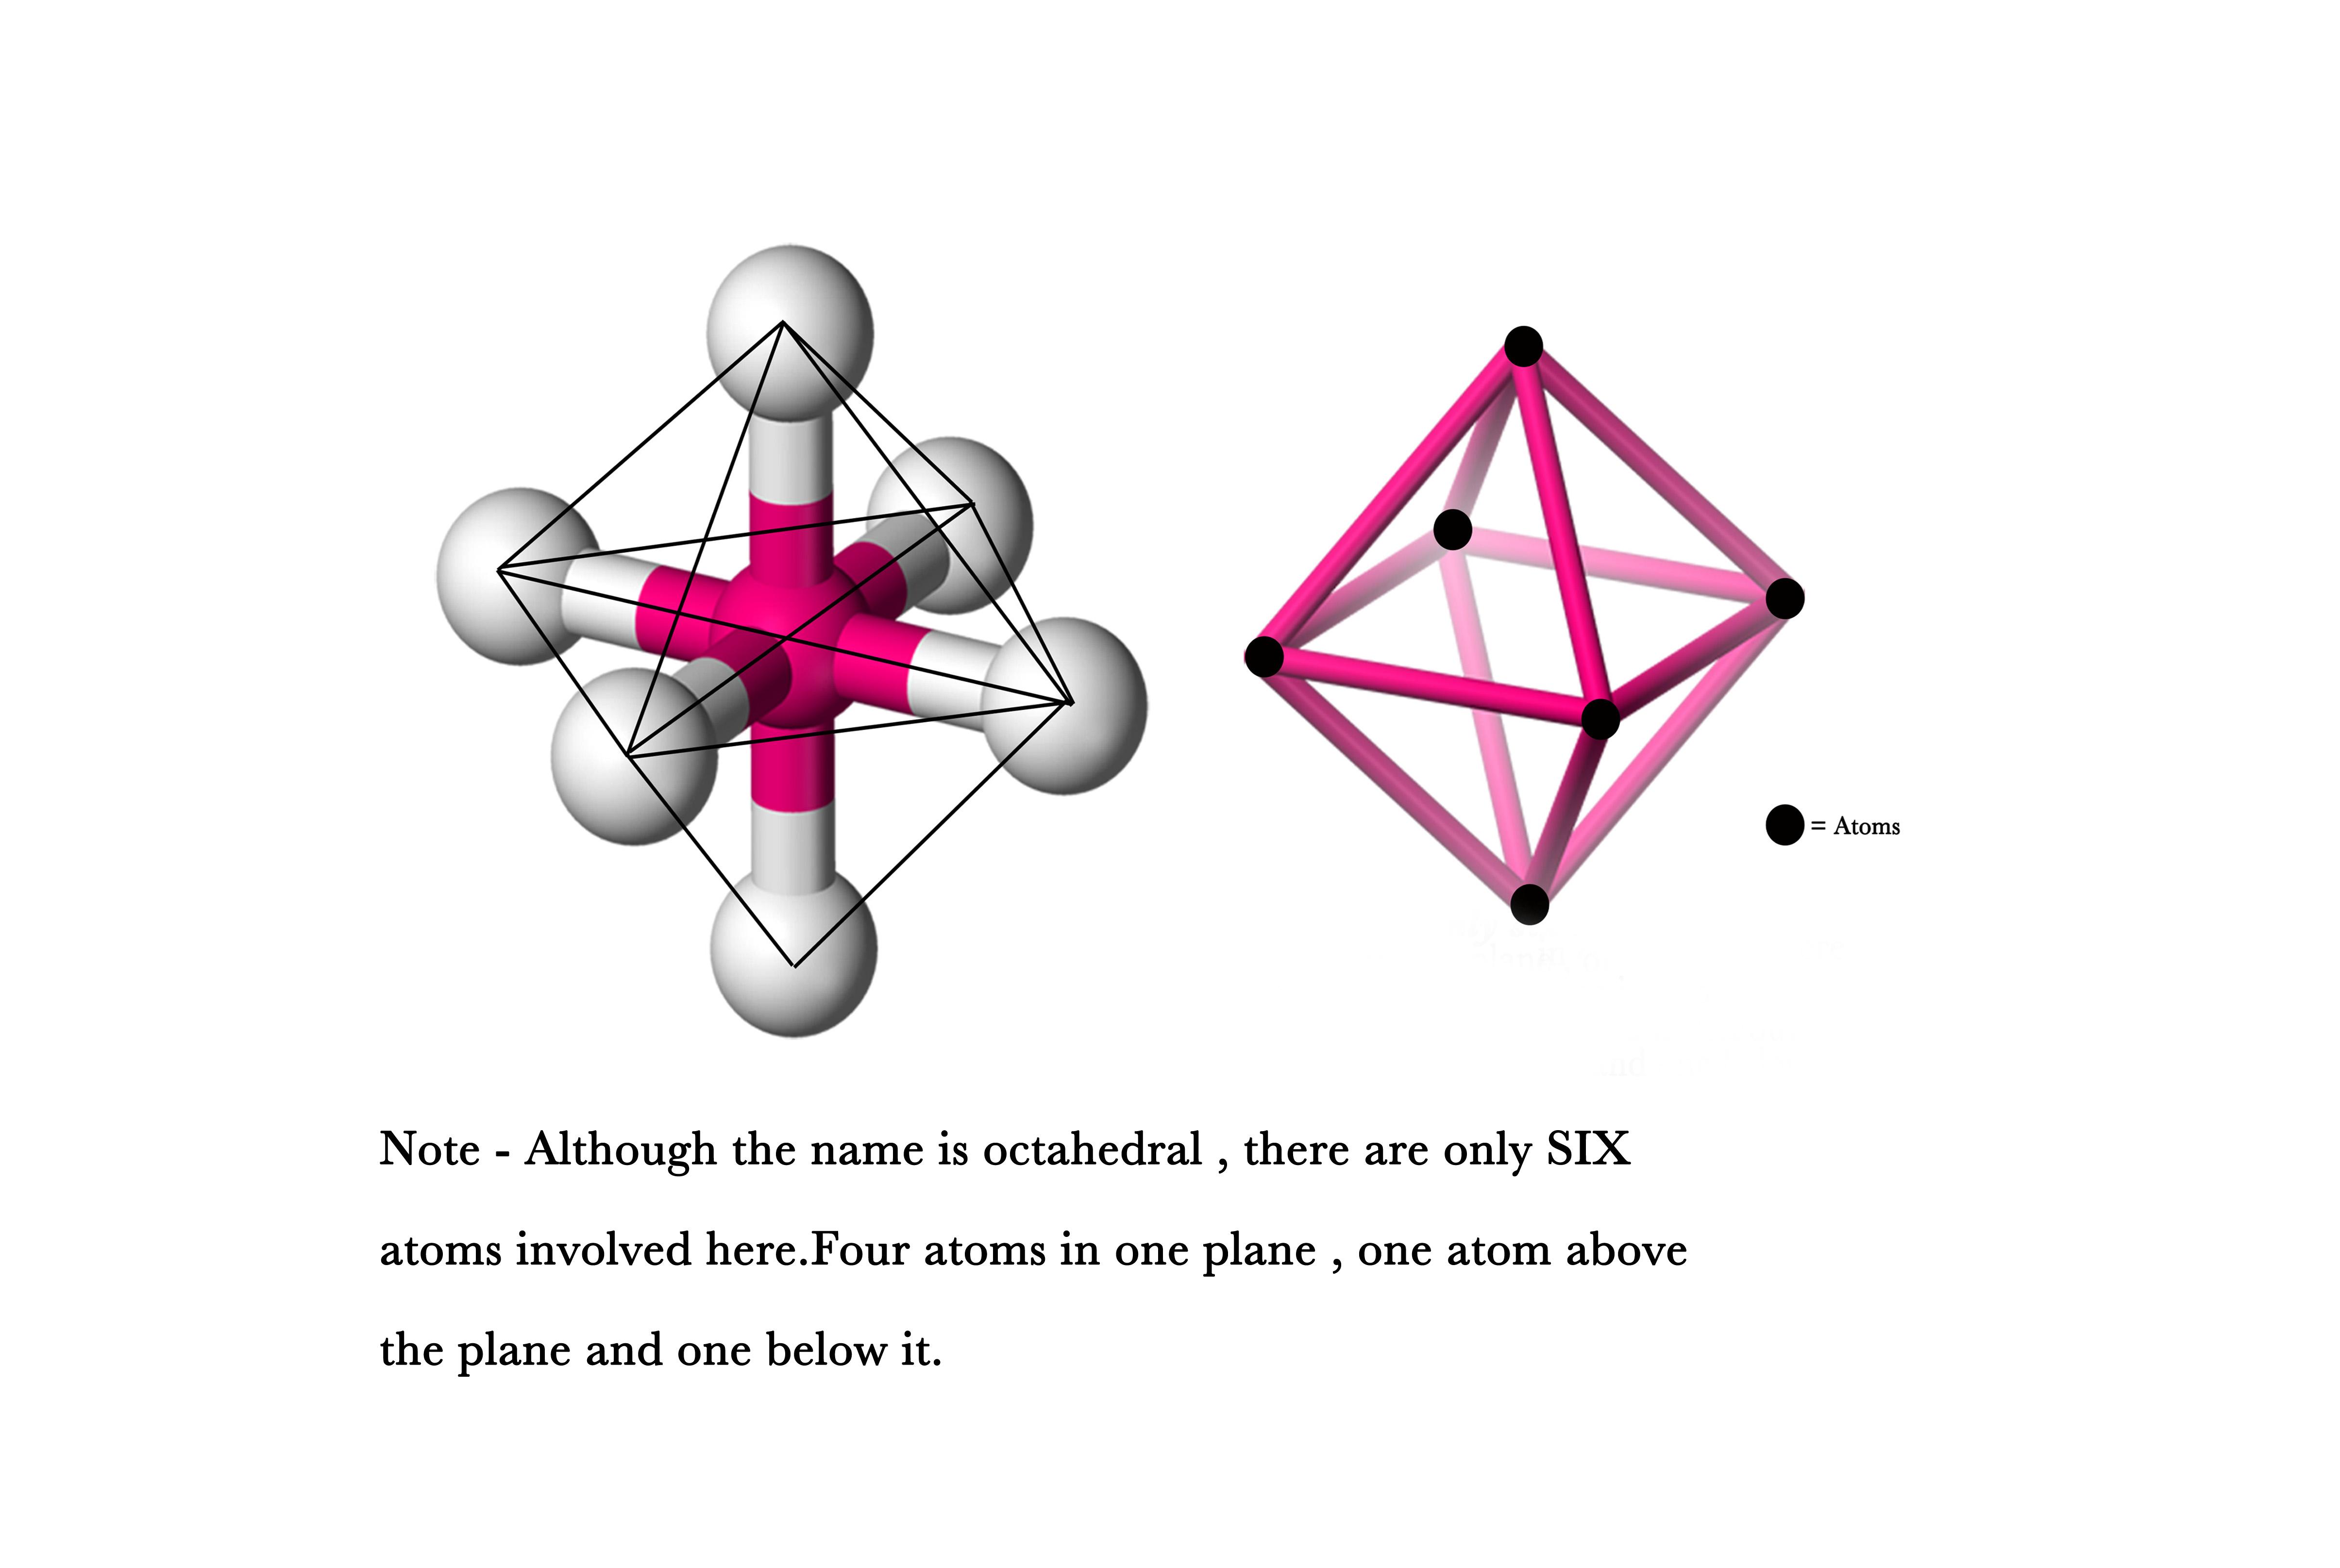 57emical Bonding 4 Covalent Bonding 3 Vespr Model